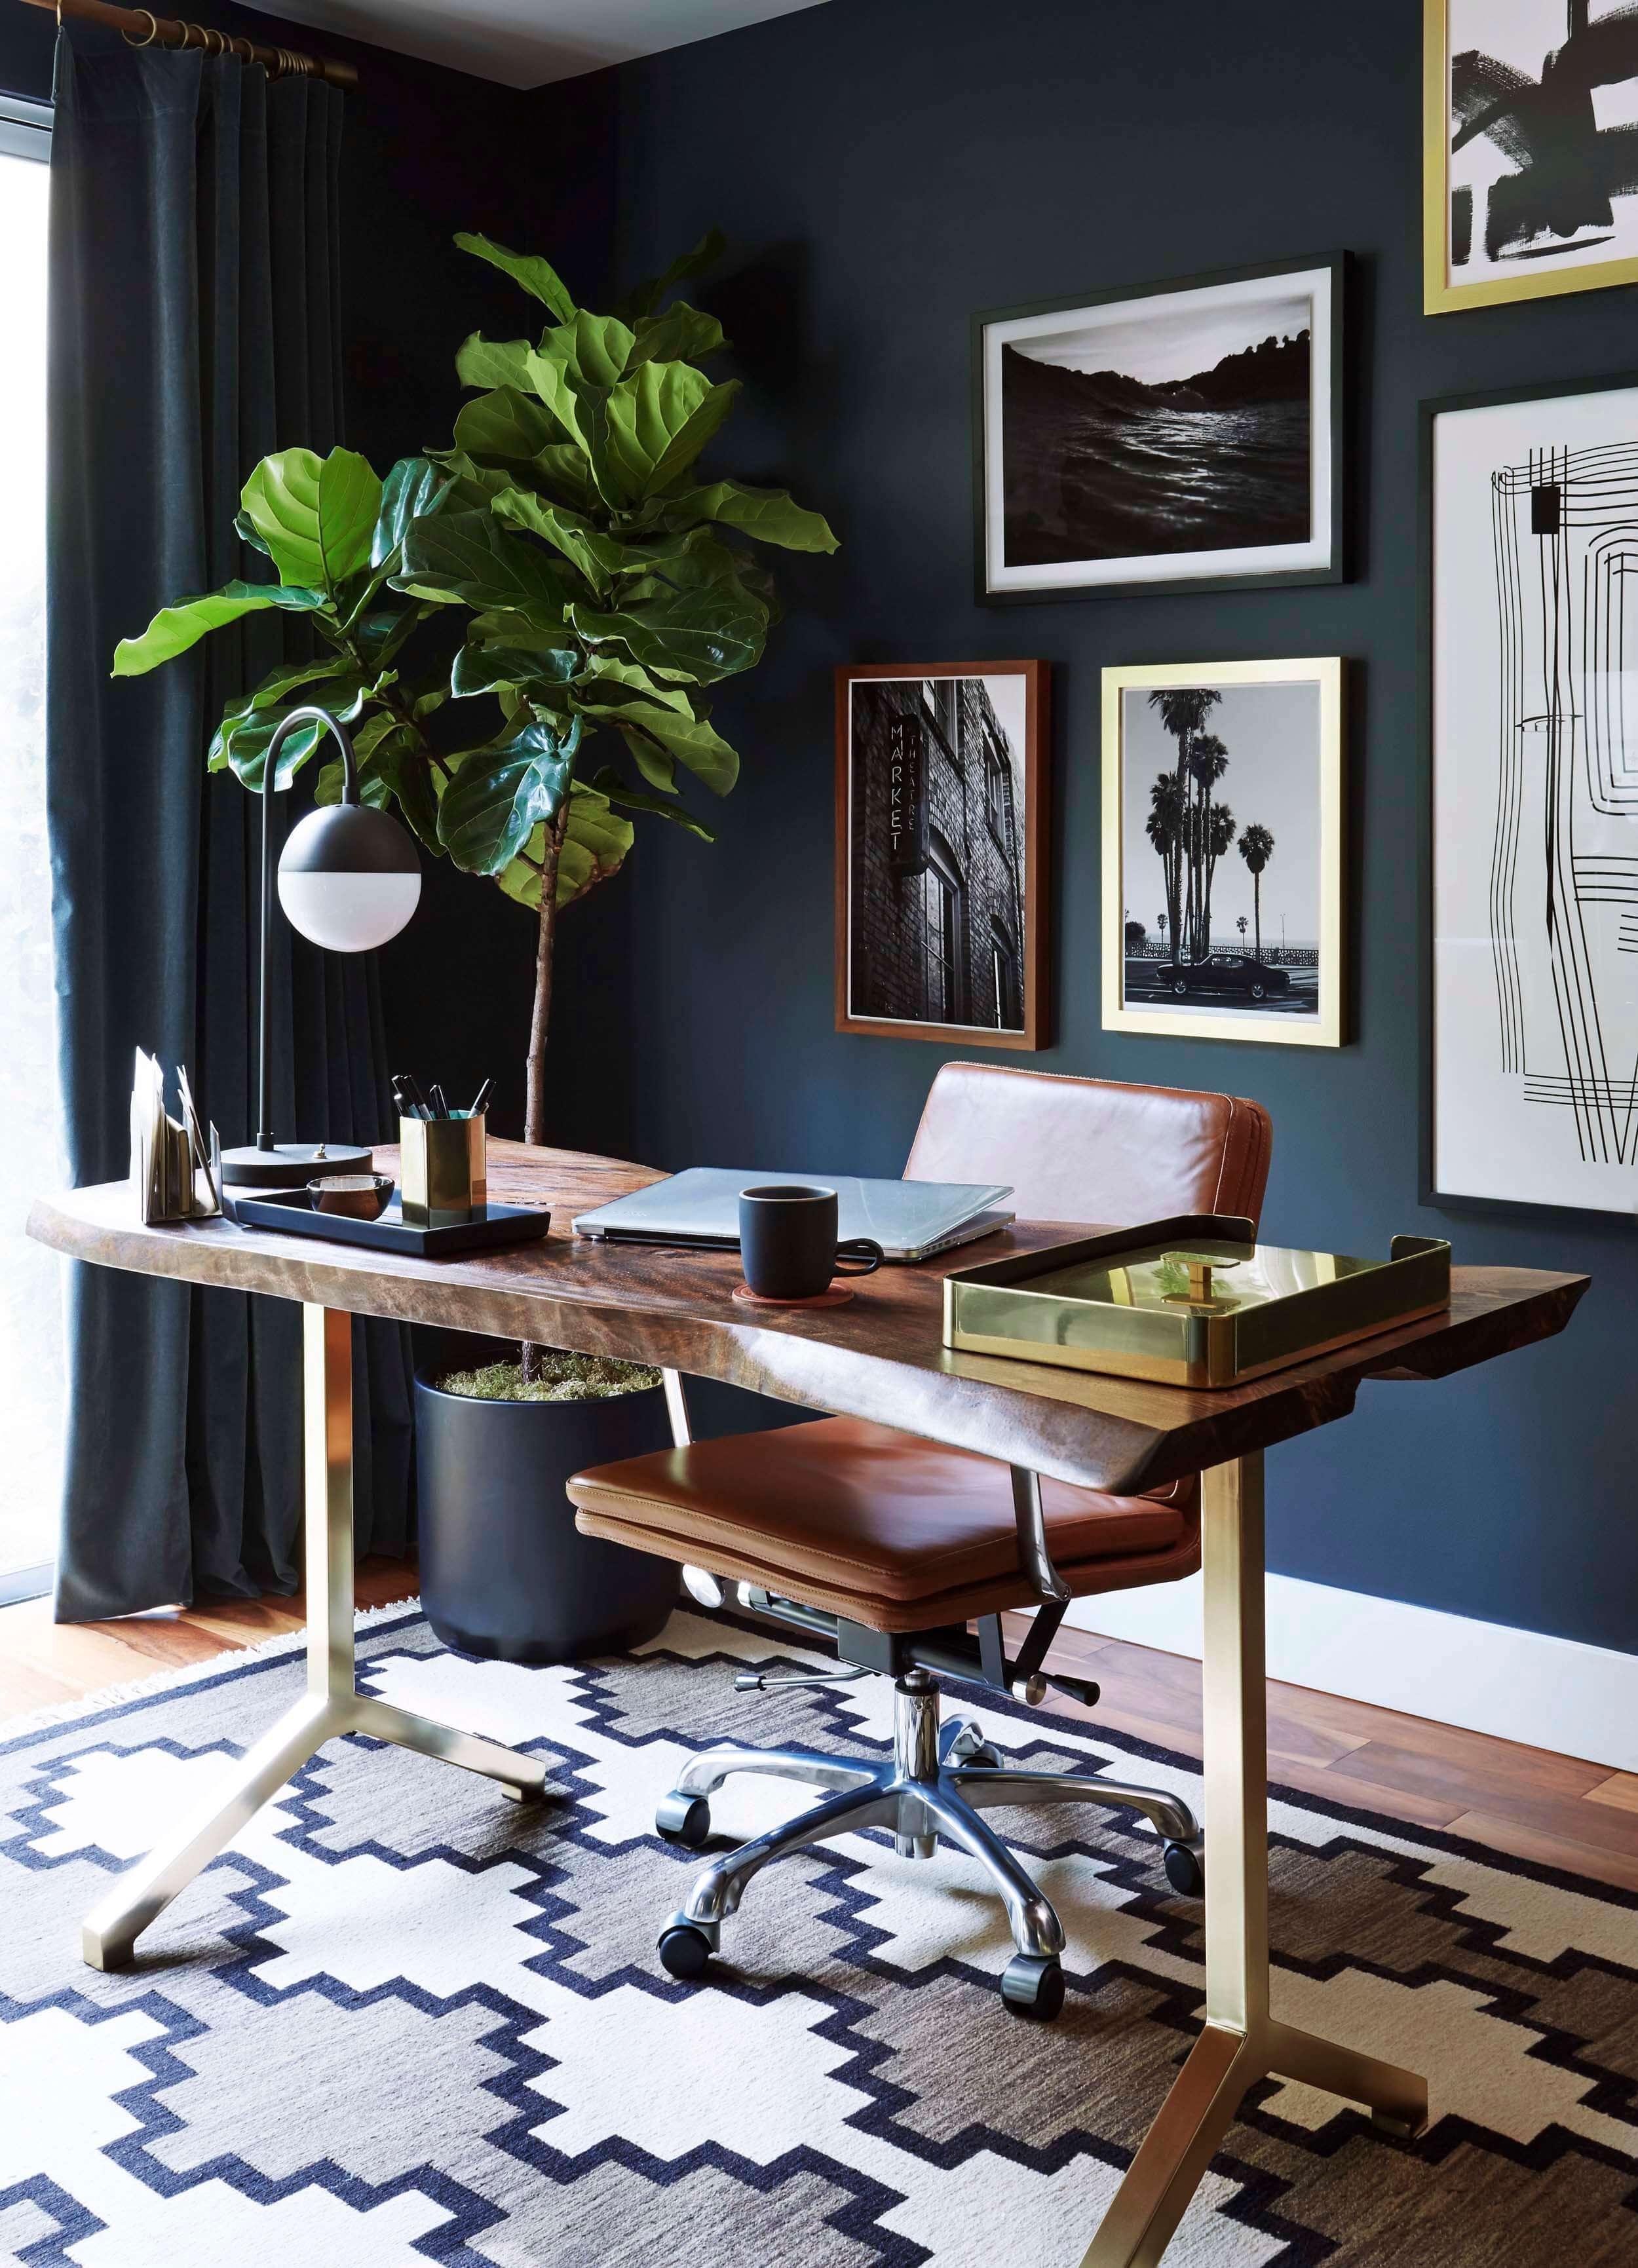 Design by Emily Henderson Design Photo by Tessa Neustadt_1.jpg